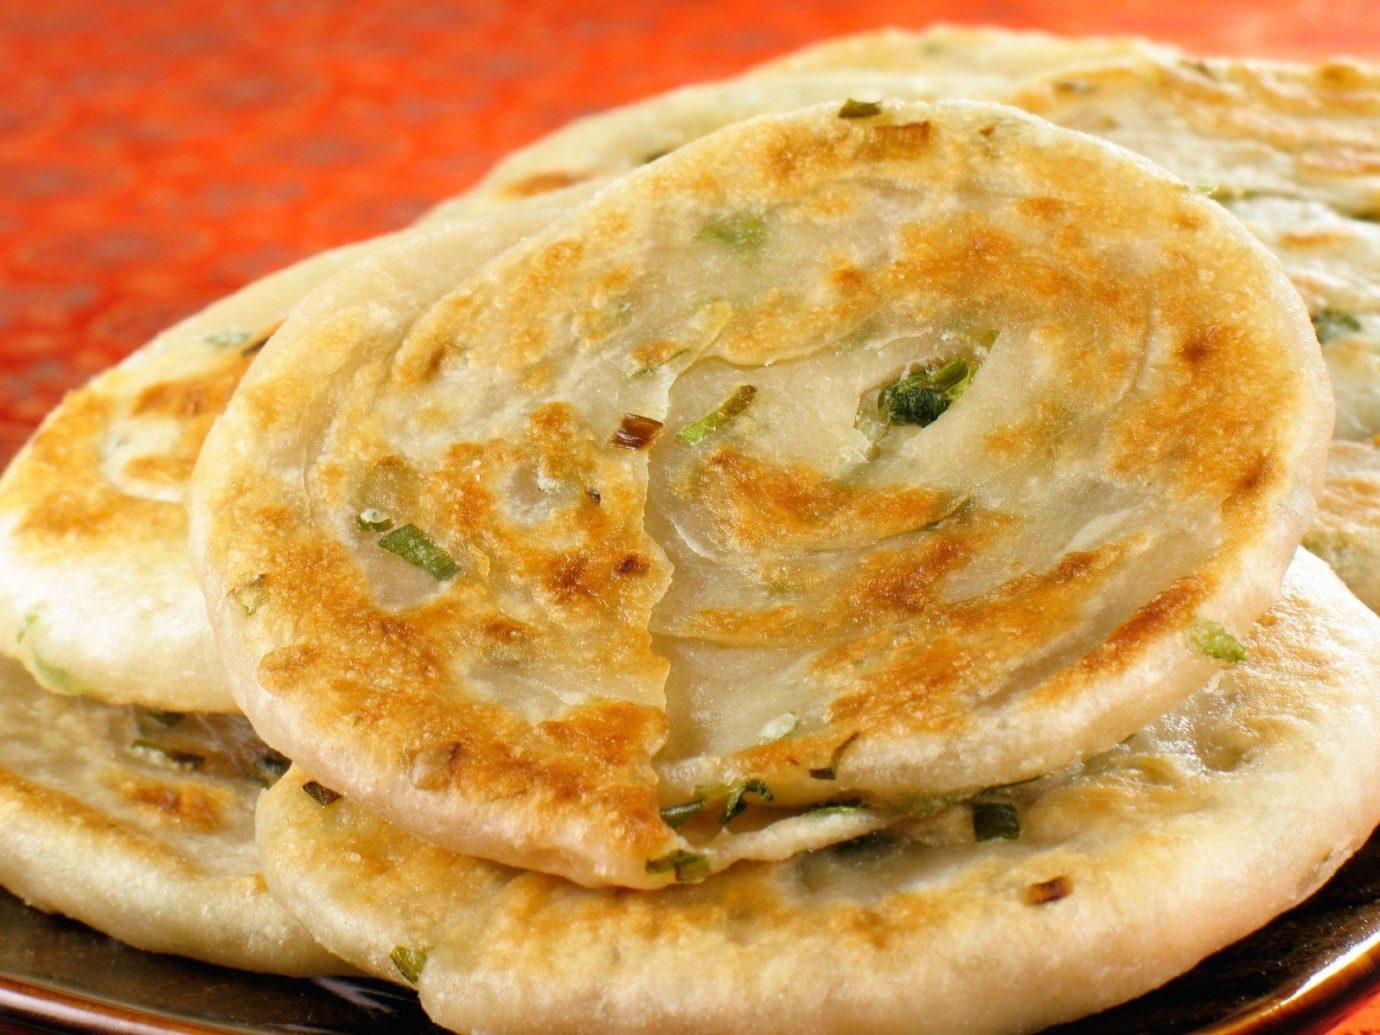 Trip Ideas food dish naan cuisine hotteok breakfast baked goods pupusa bread roti flatbread meal roti prata roti canai paratha produce tortilla de patatas indian cuisine khachapuri